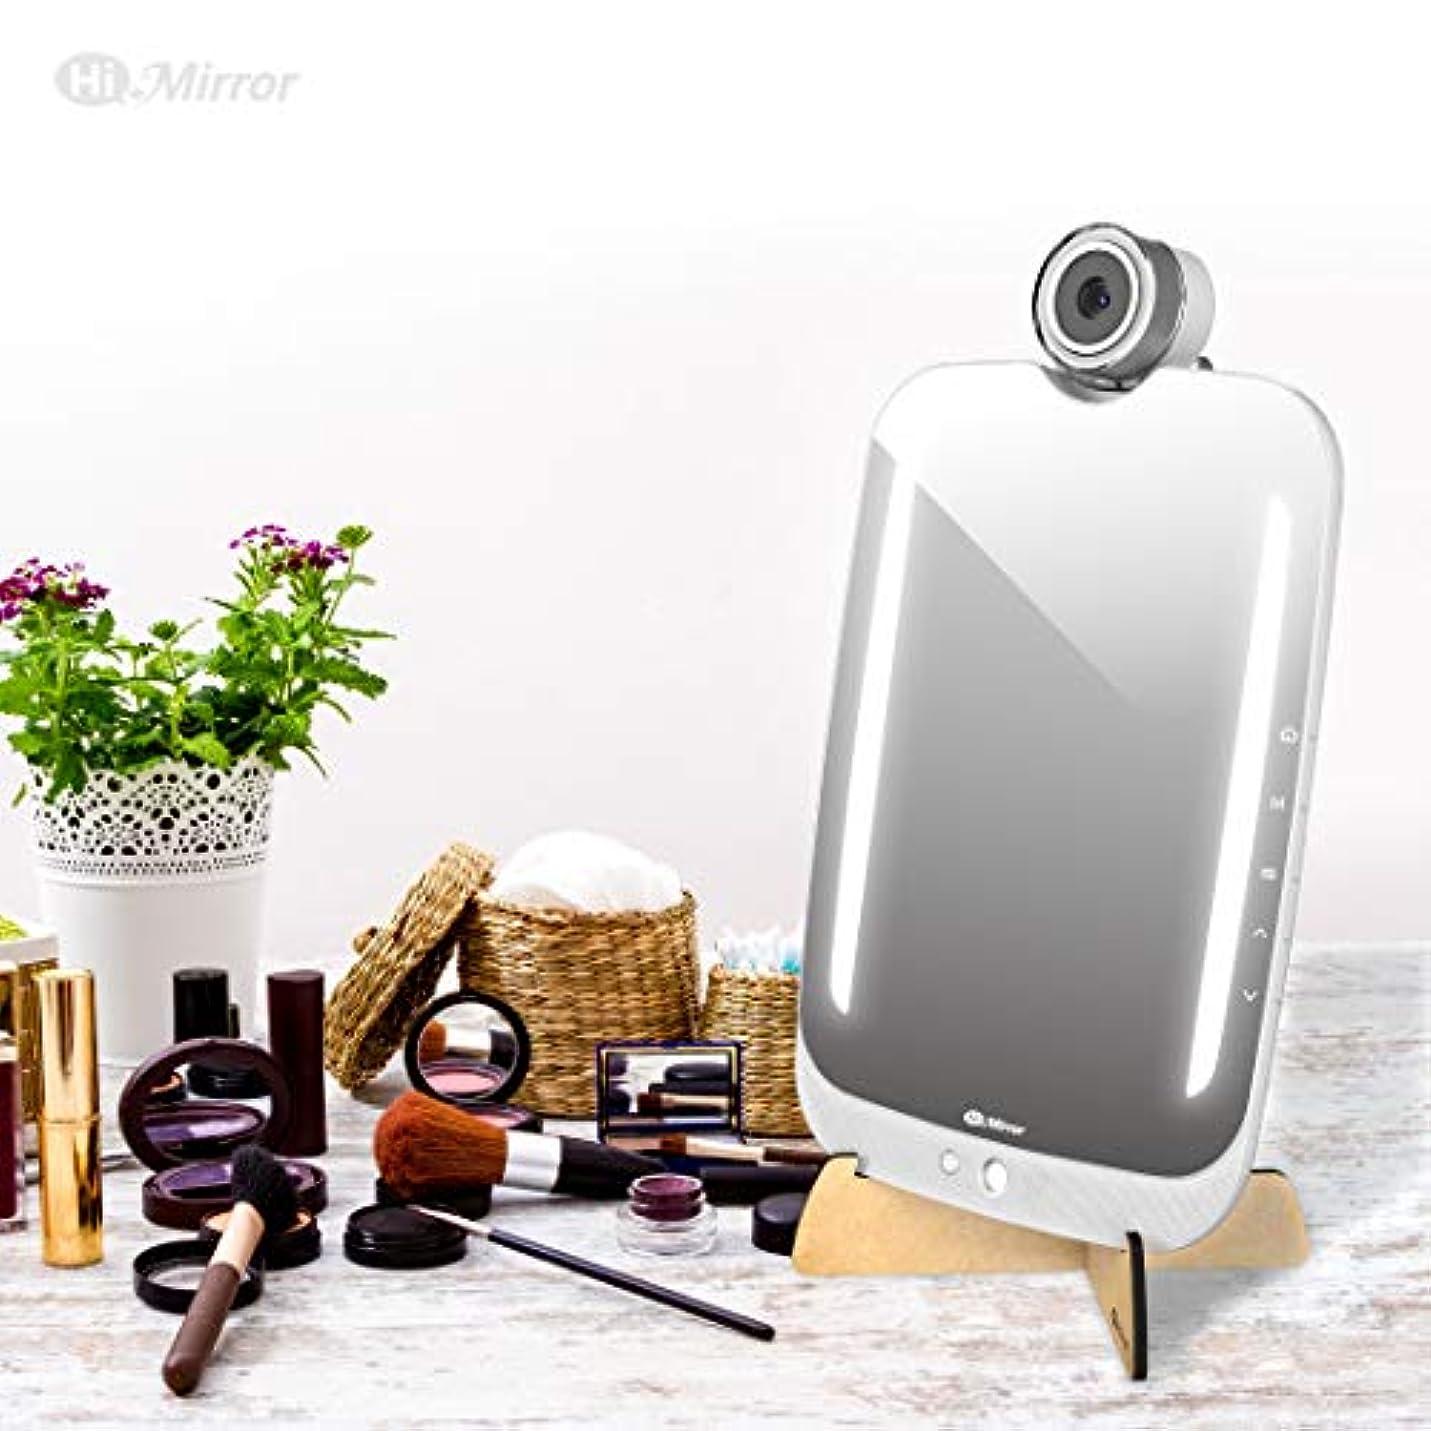 HiMirrorプラス-デバイス型ビューティミラー、メイクアップシミュレーションAR新機能搭載、高精度カメラ機能とアプリケーションによる肌分析 BM618RC00AB